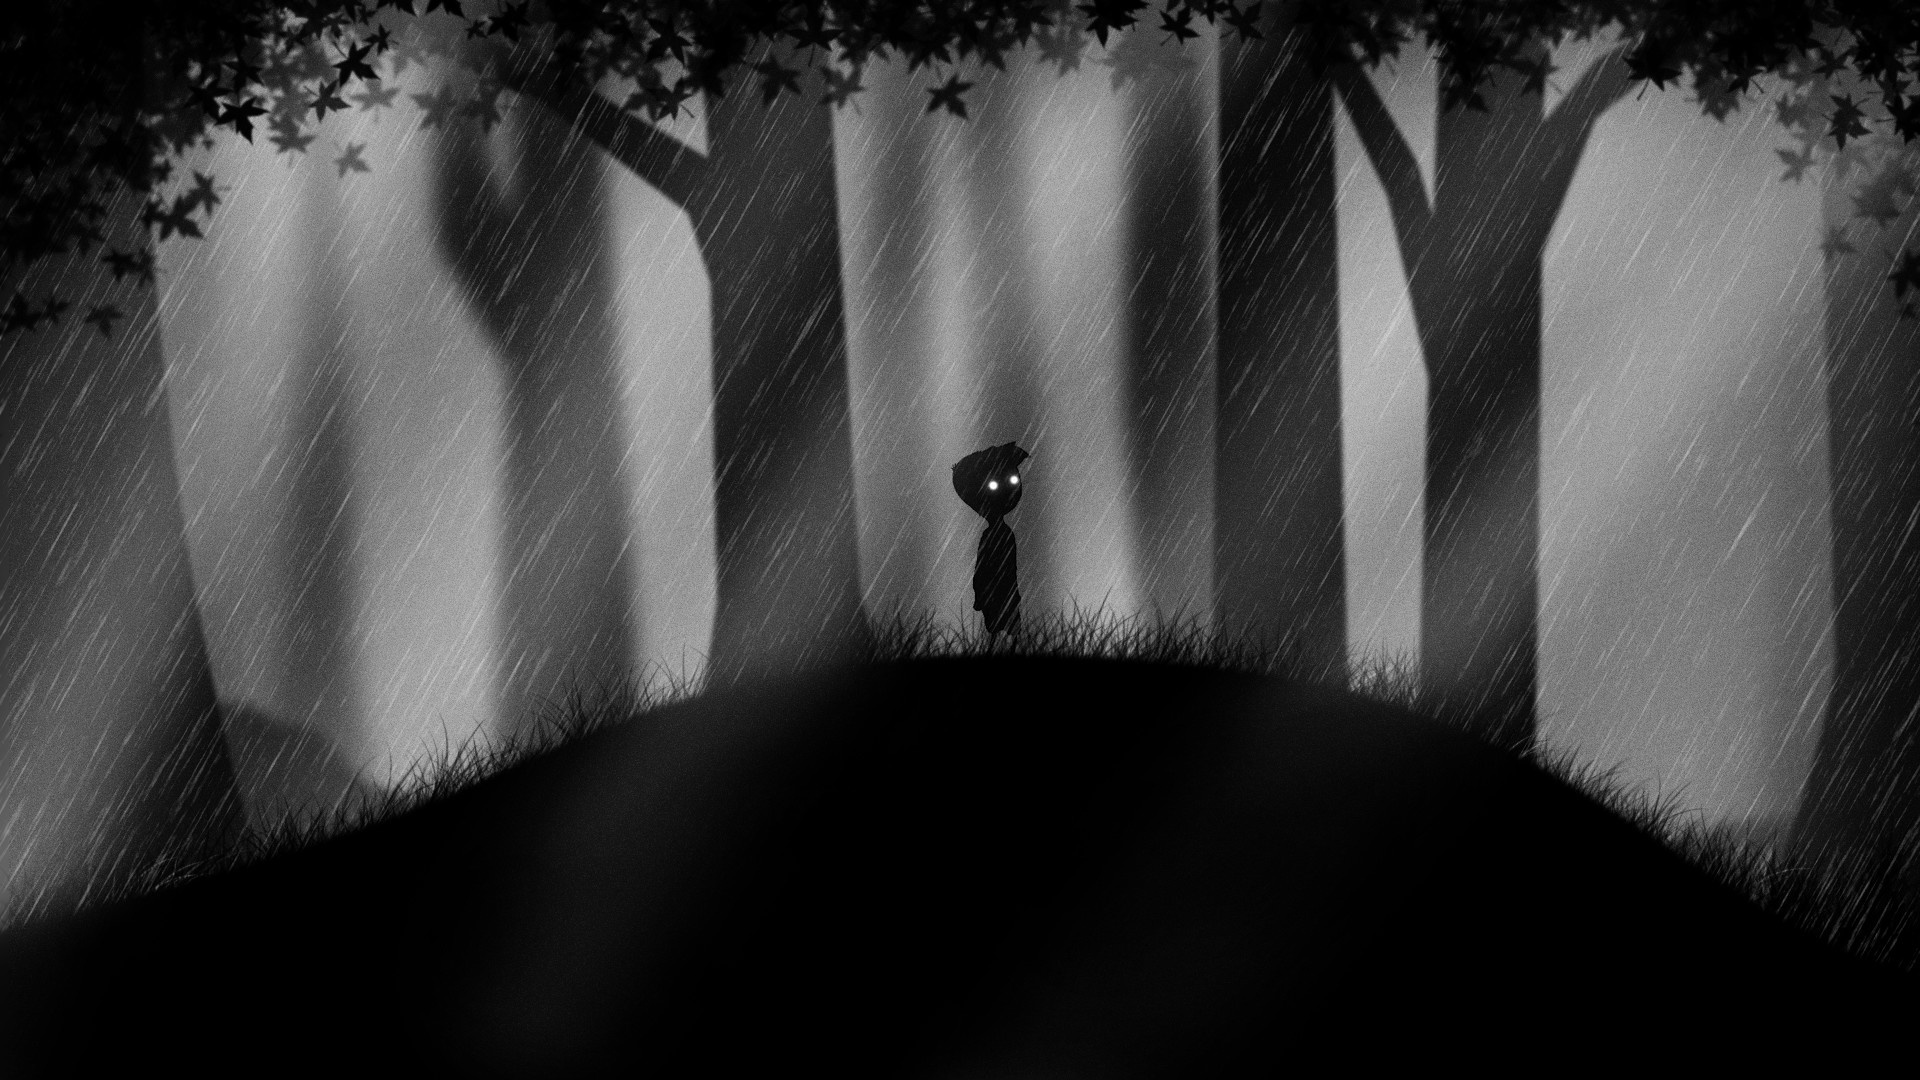 … Limbo Wallpaper [Rainy Forest] [FanArt] by CIT101